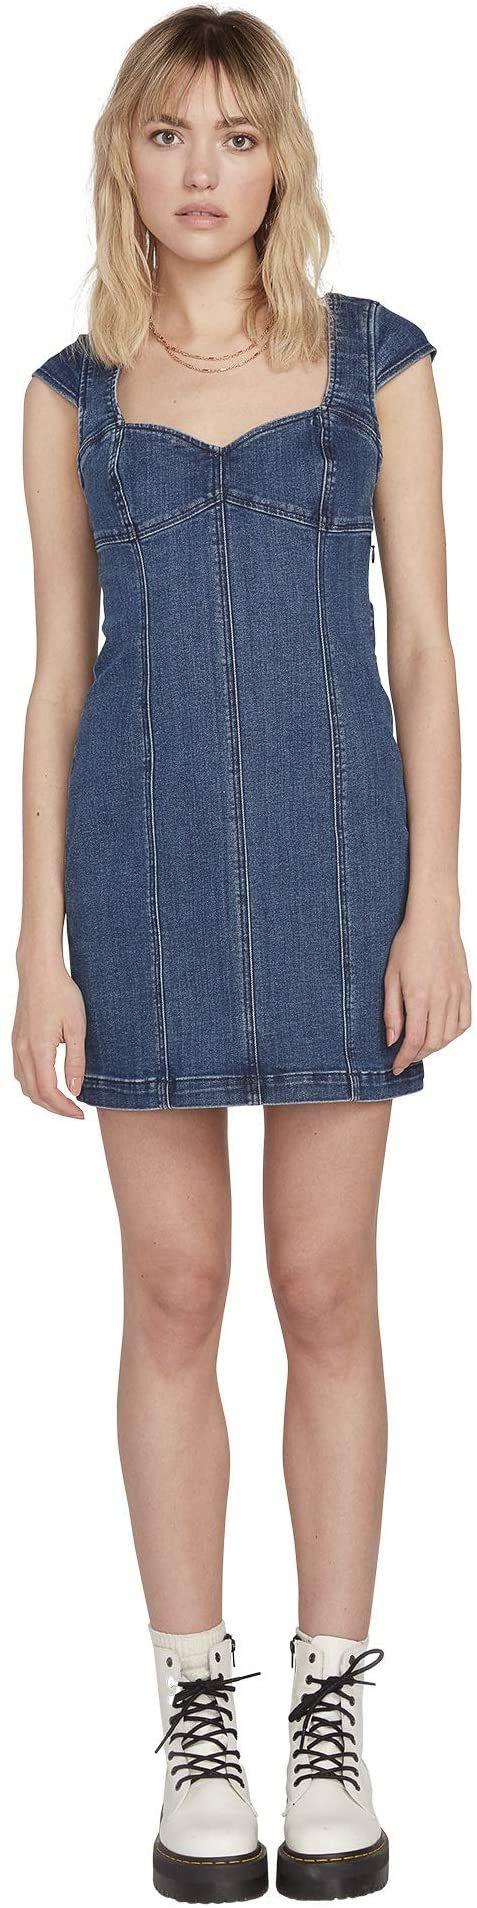 Volcom Damska sukienka w Not Sweet niebieski Indigo Ridge Wash XL